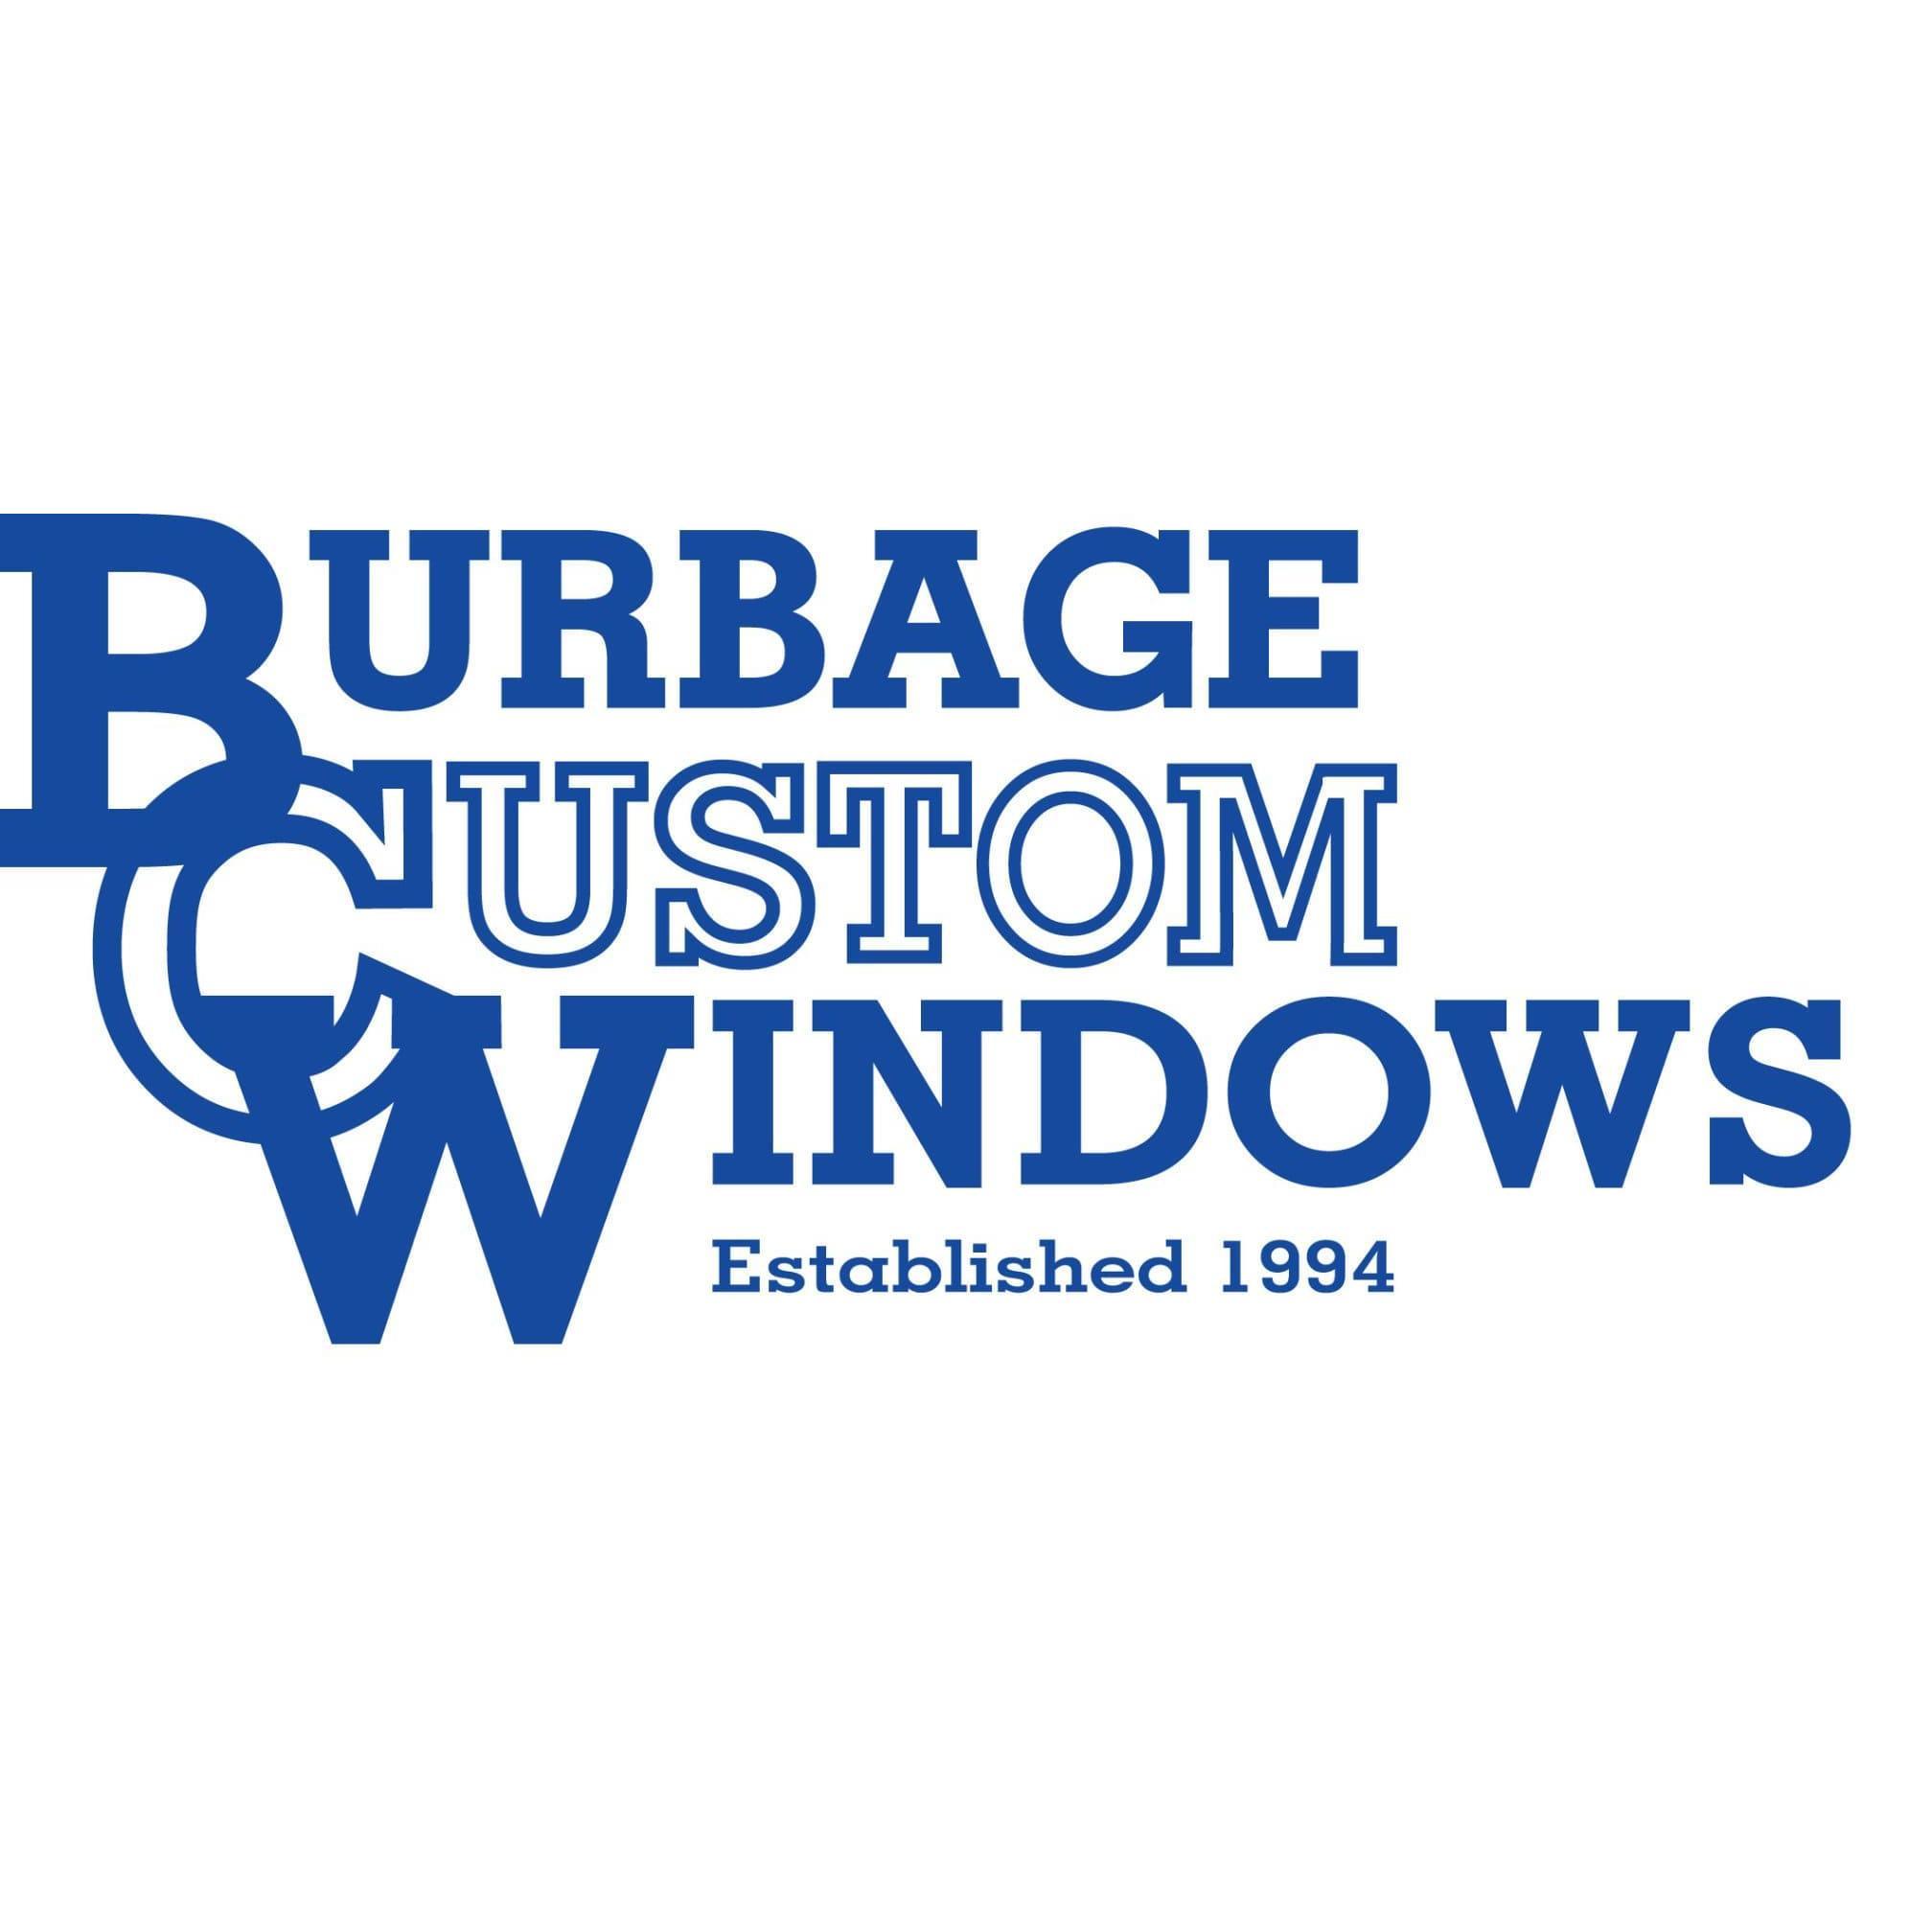 Burbage Custom Windows Ltd